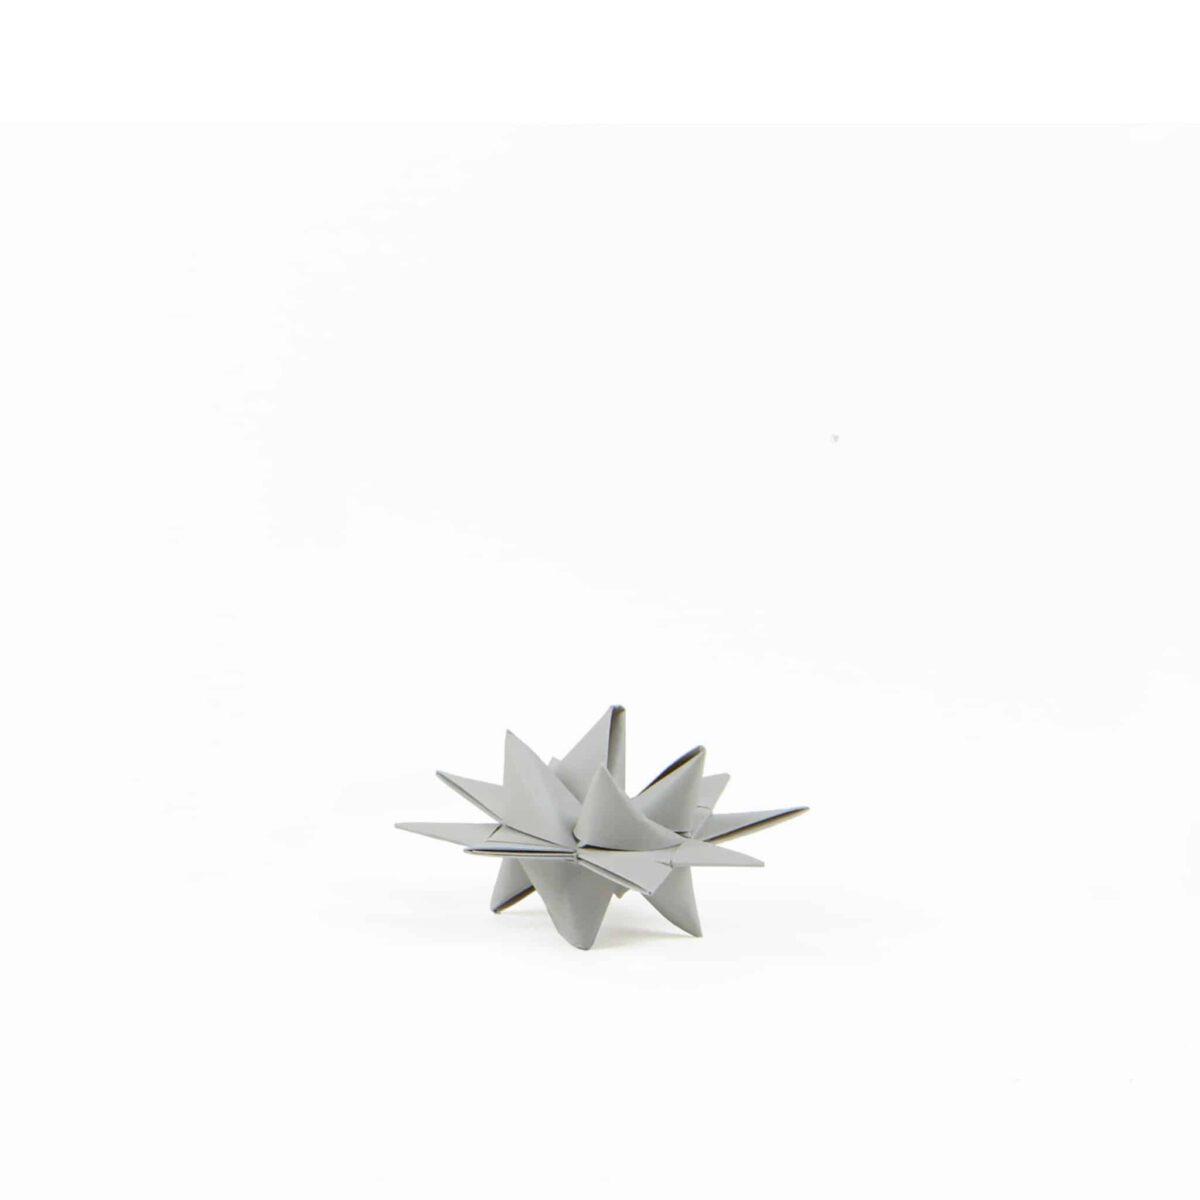 swedish-star-001.jpg